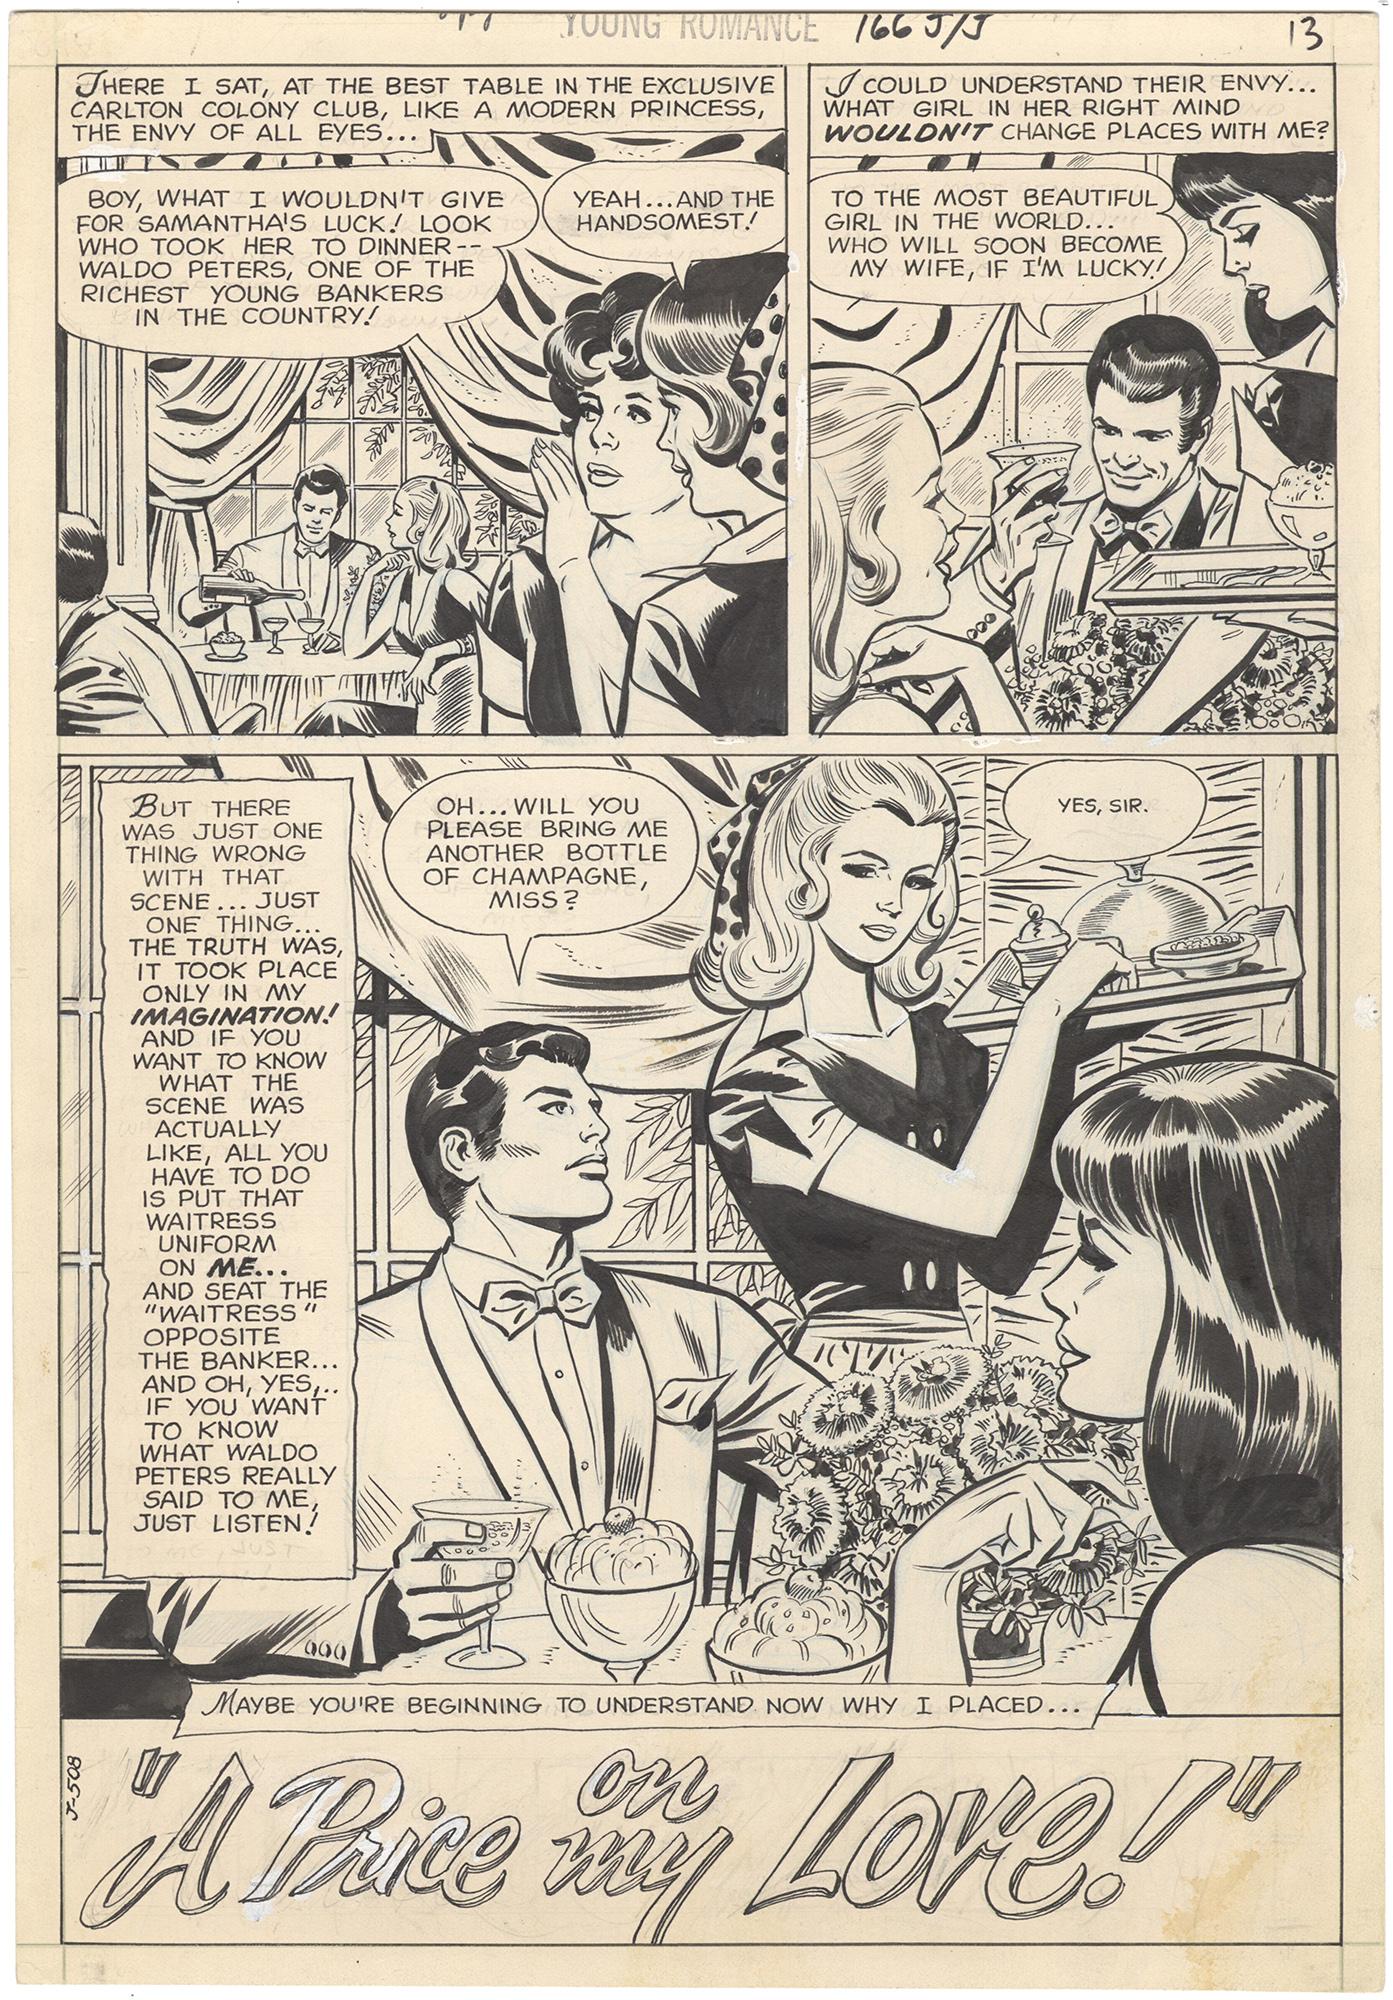 Young Romance #166 p13